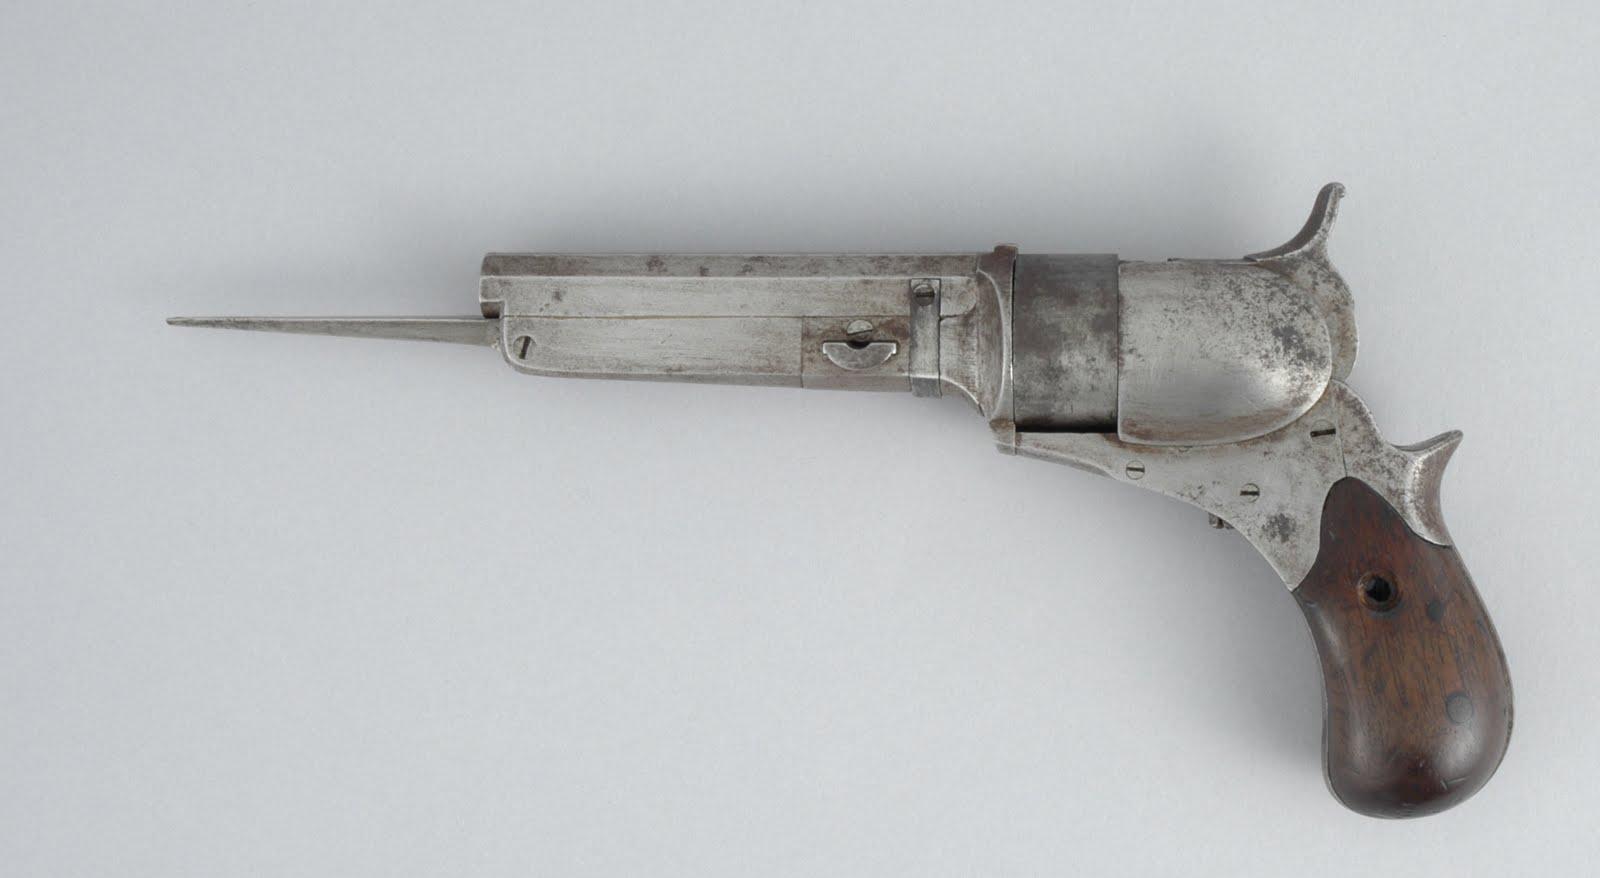 Colt Revolver 1835 Prototype Colt Revolver 1835